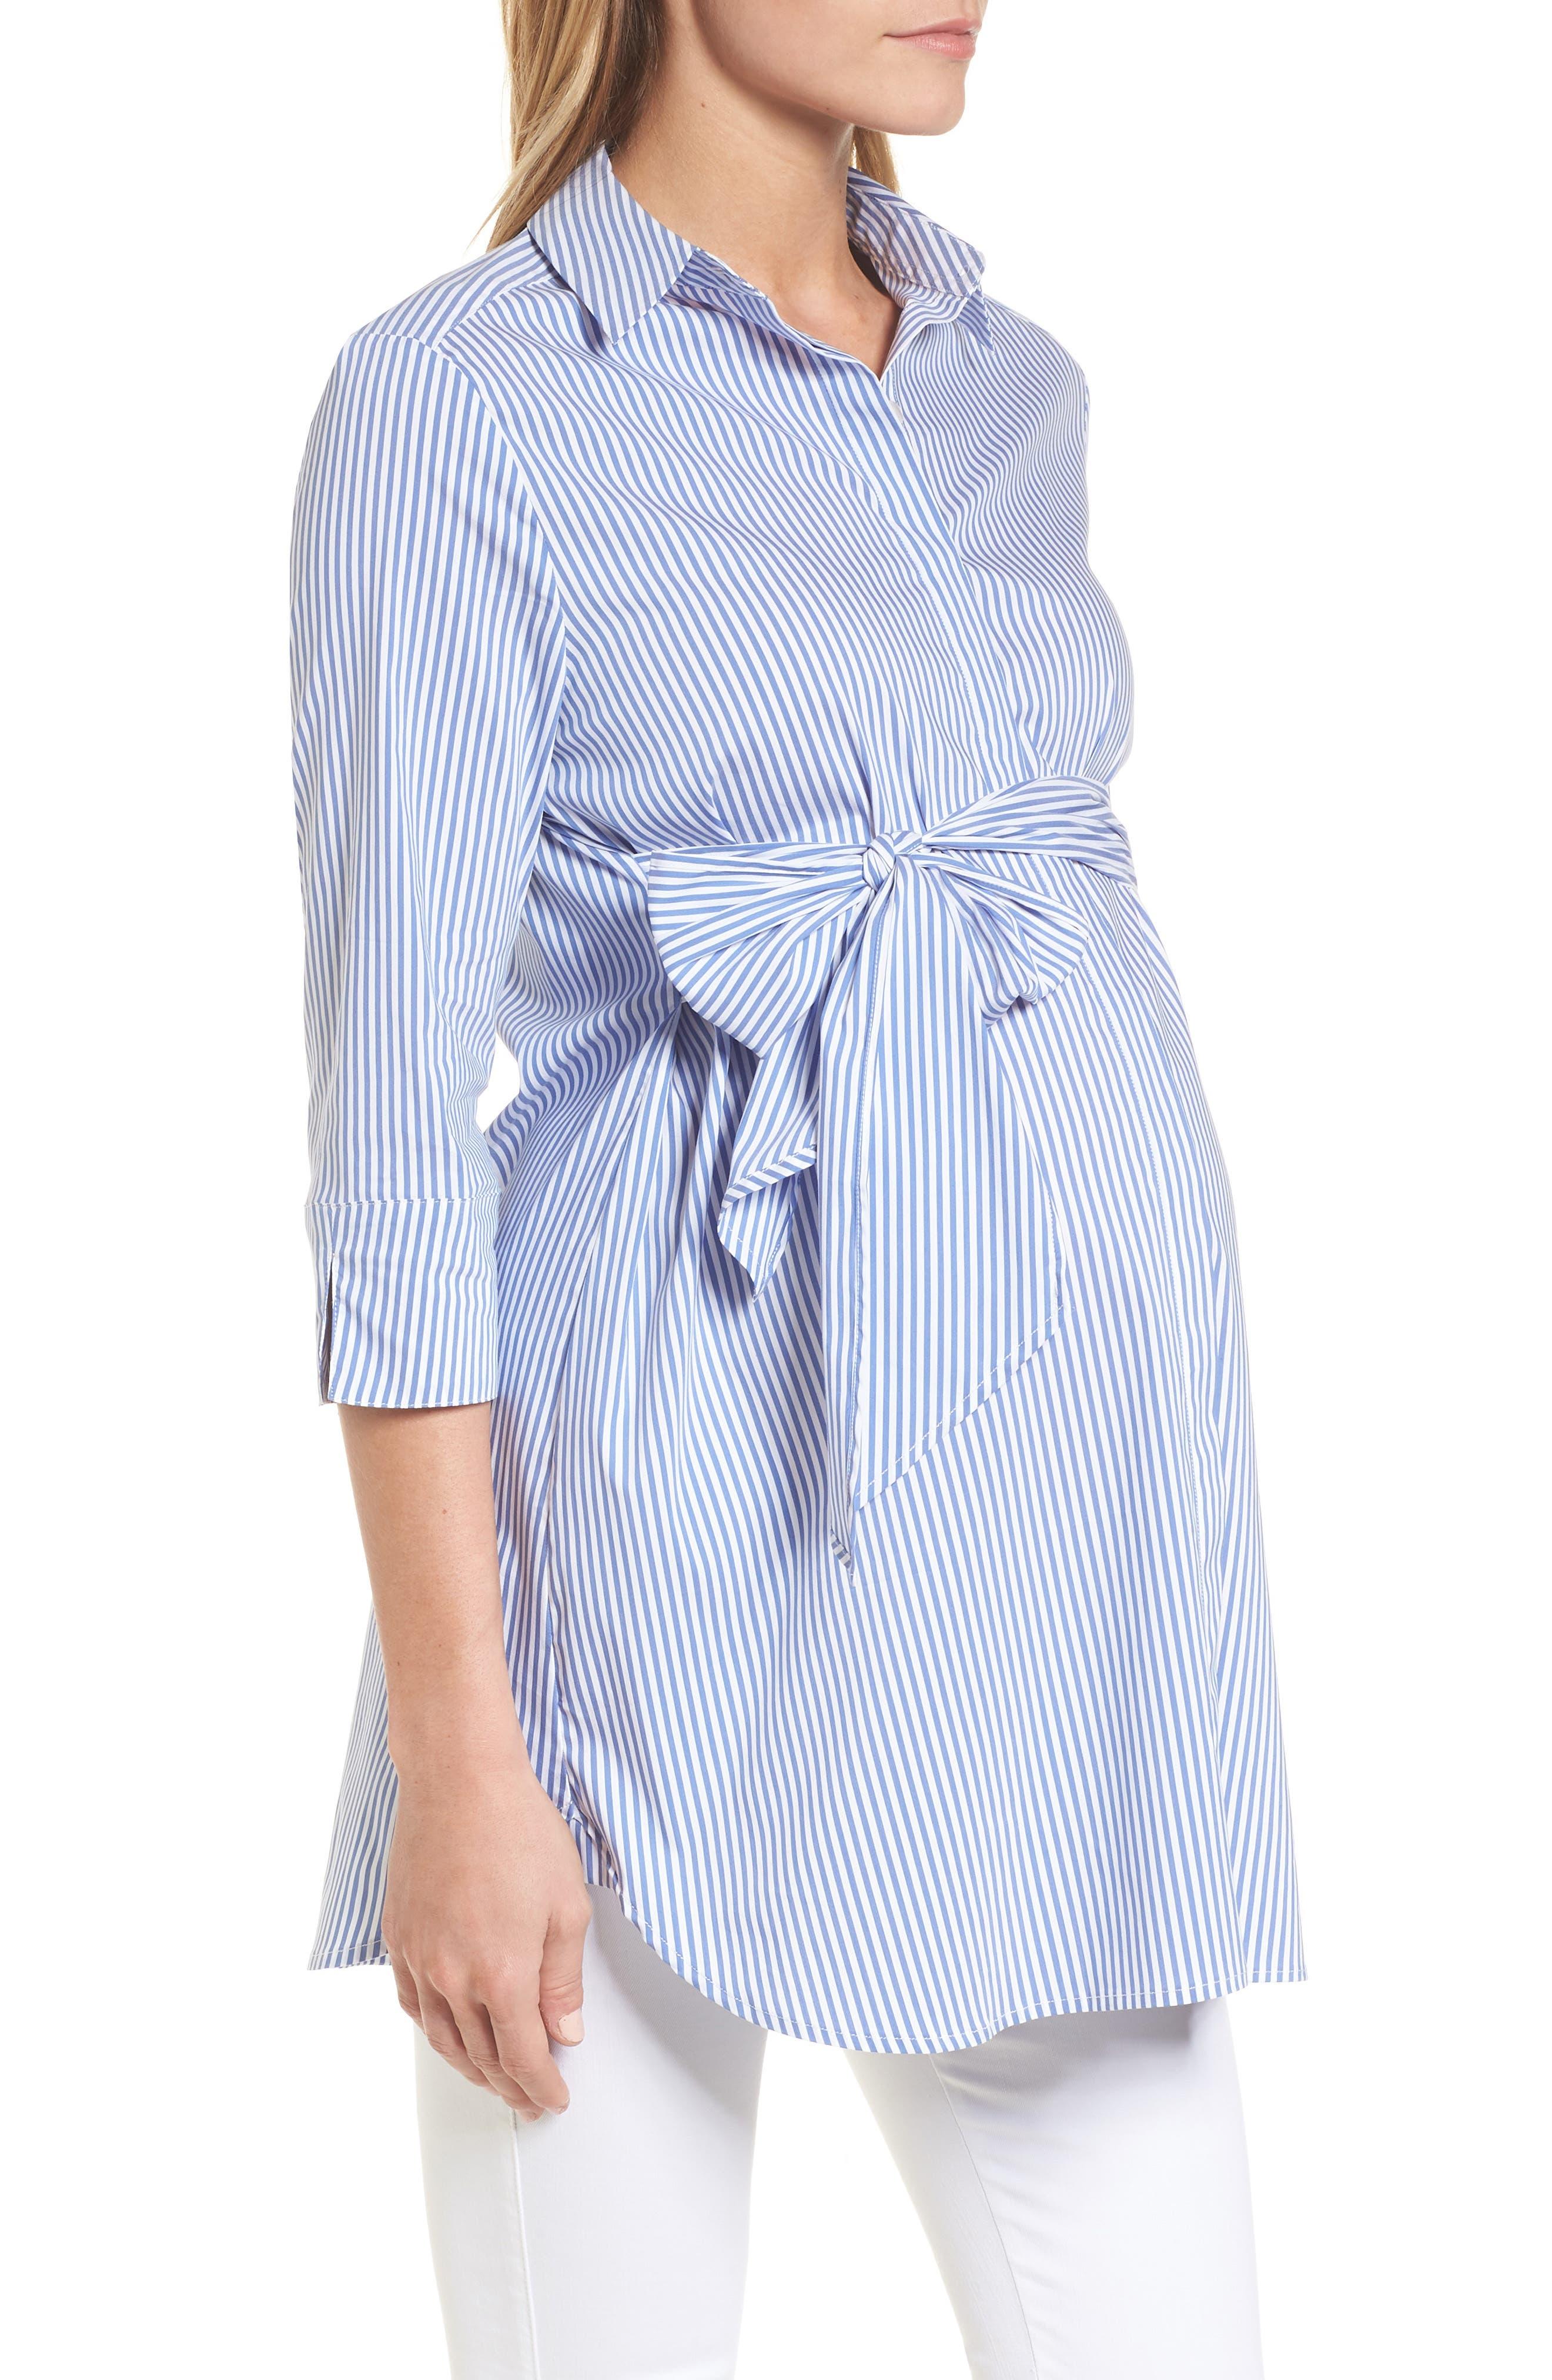 Dora Tie Front Maternity Shirt,                             Alternate thumbnail 3, color,                             BLUE/WHITE STRIPE